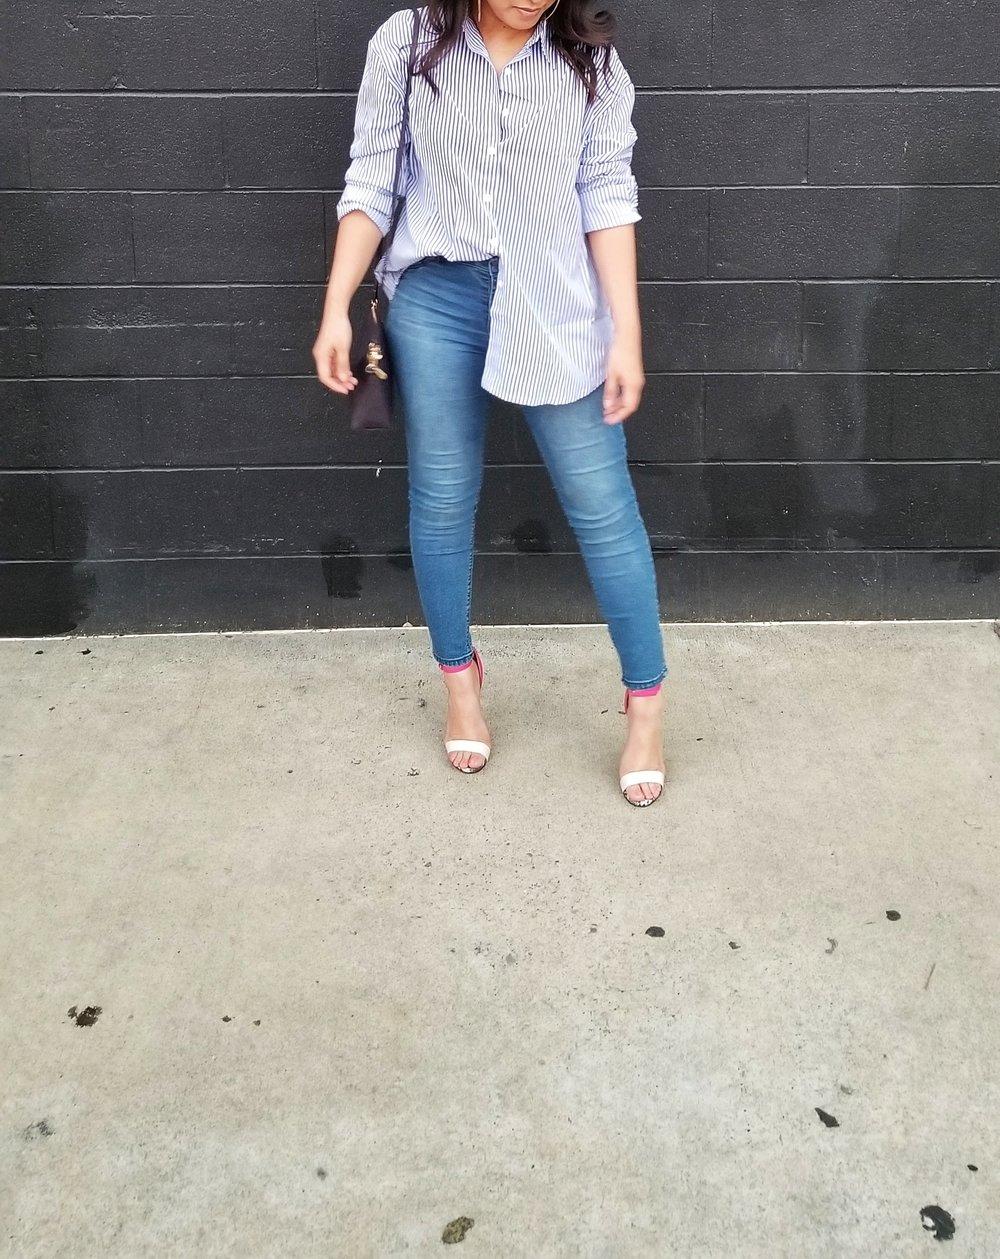 Bottom: Blue Spice jeans from TJMaxx   Handbag: H&M